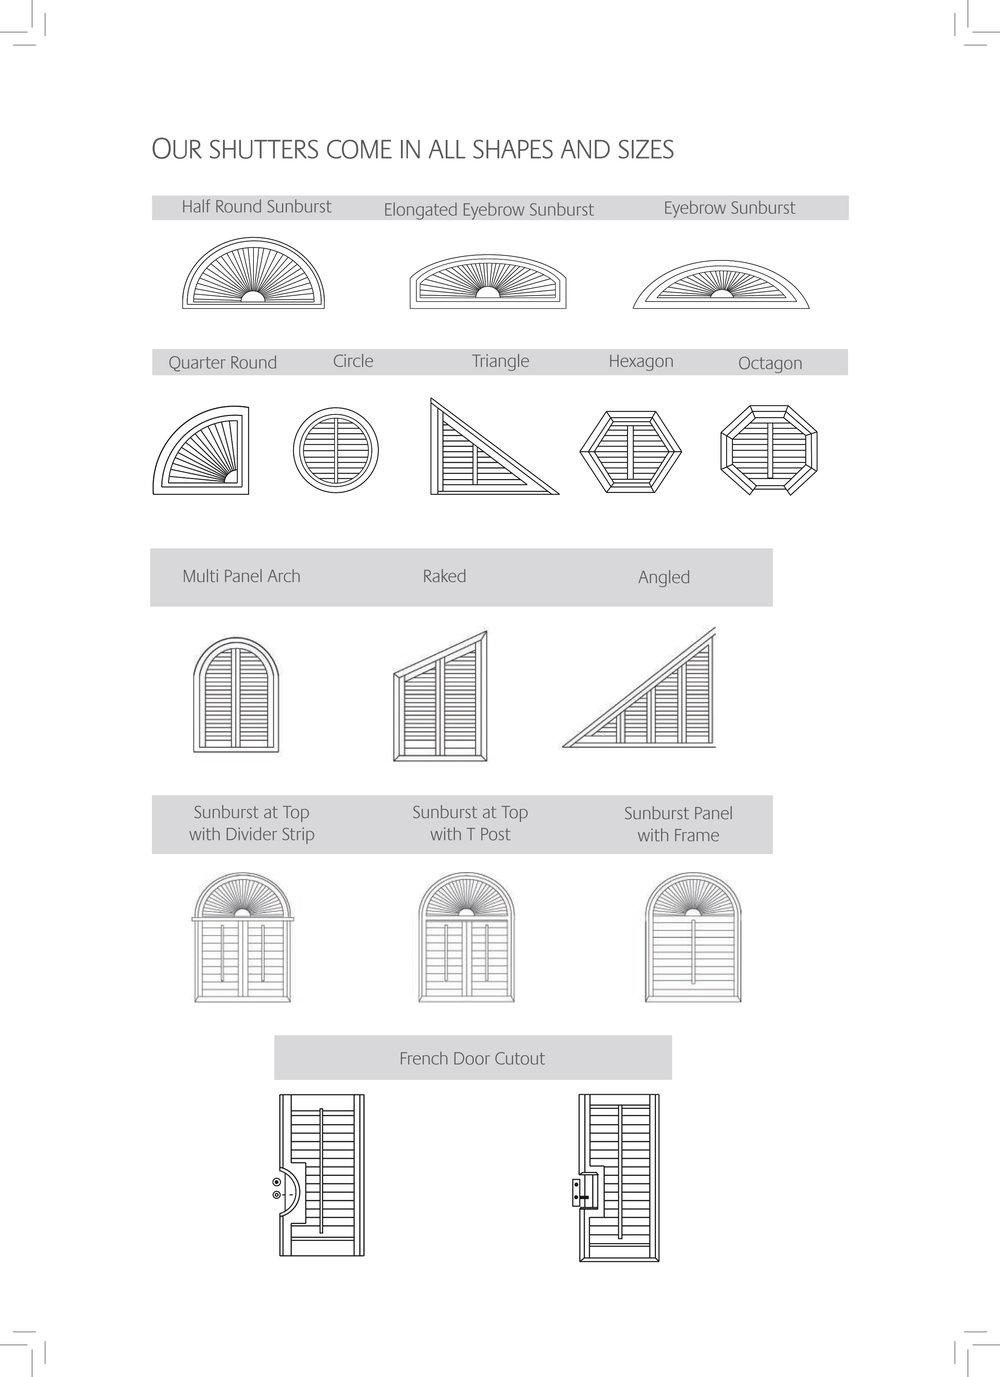 CW+Brochure+Jan16+Print+Quality+(NXPowerLite+Copy)2-17-1.jpg